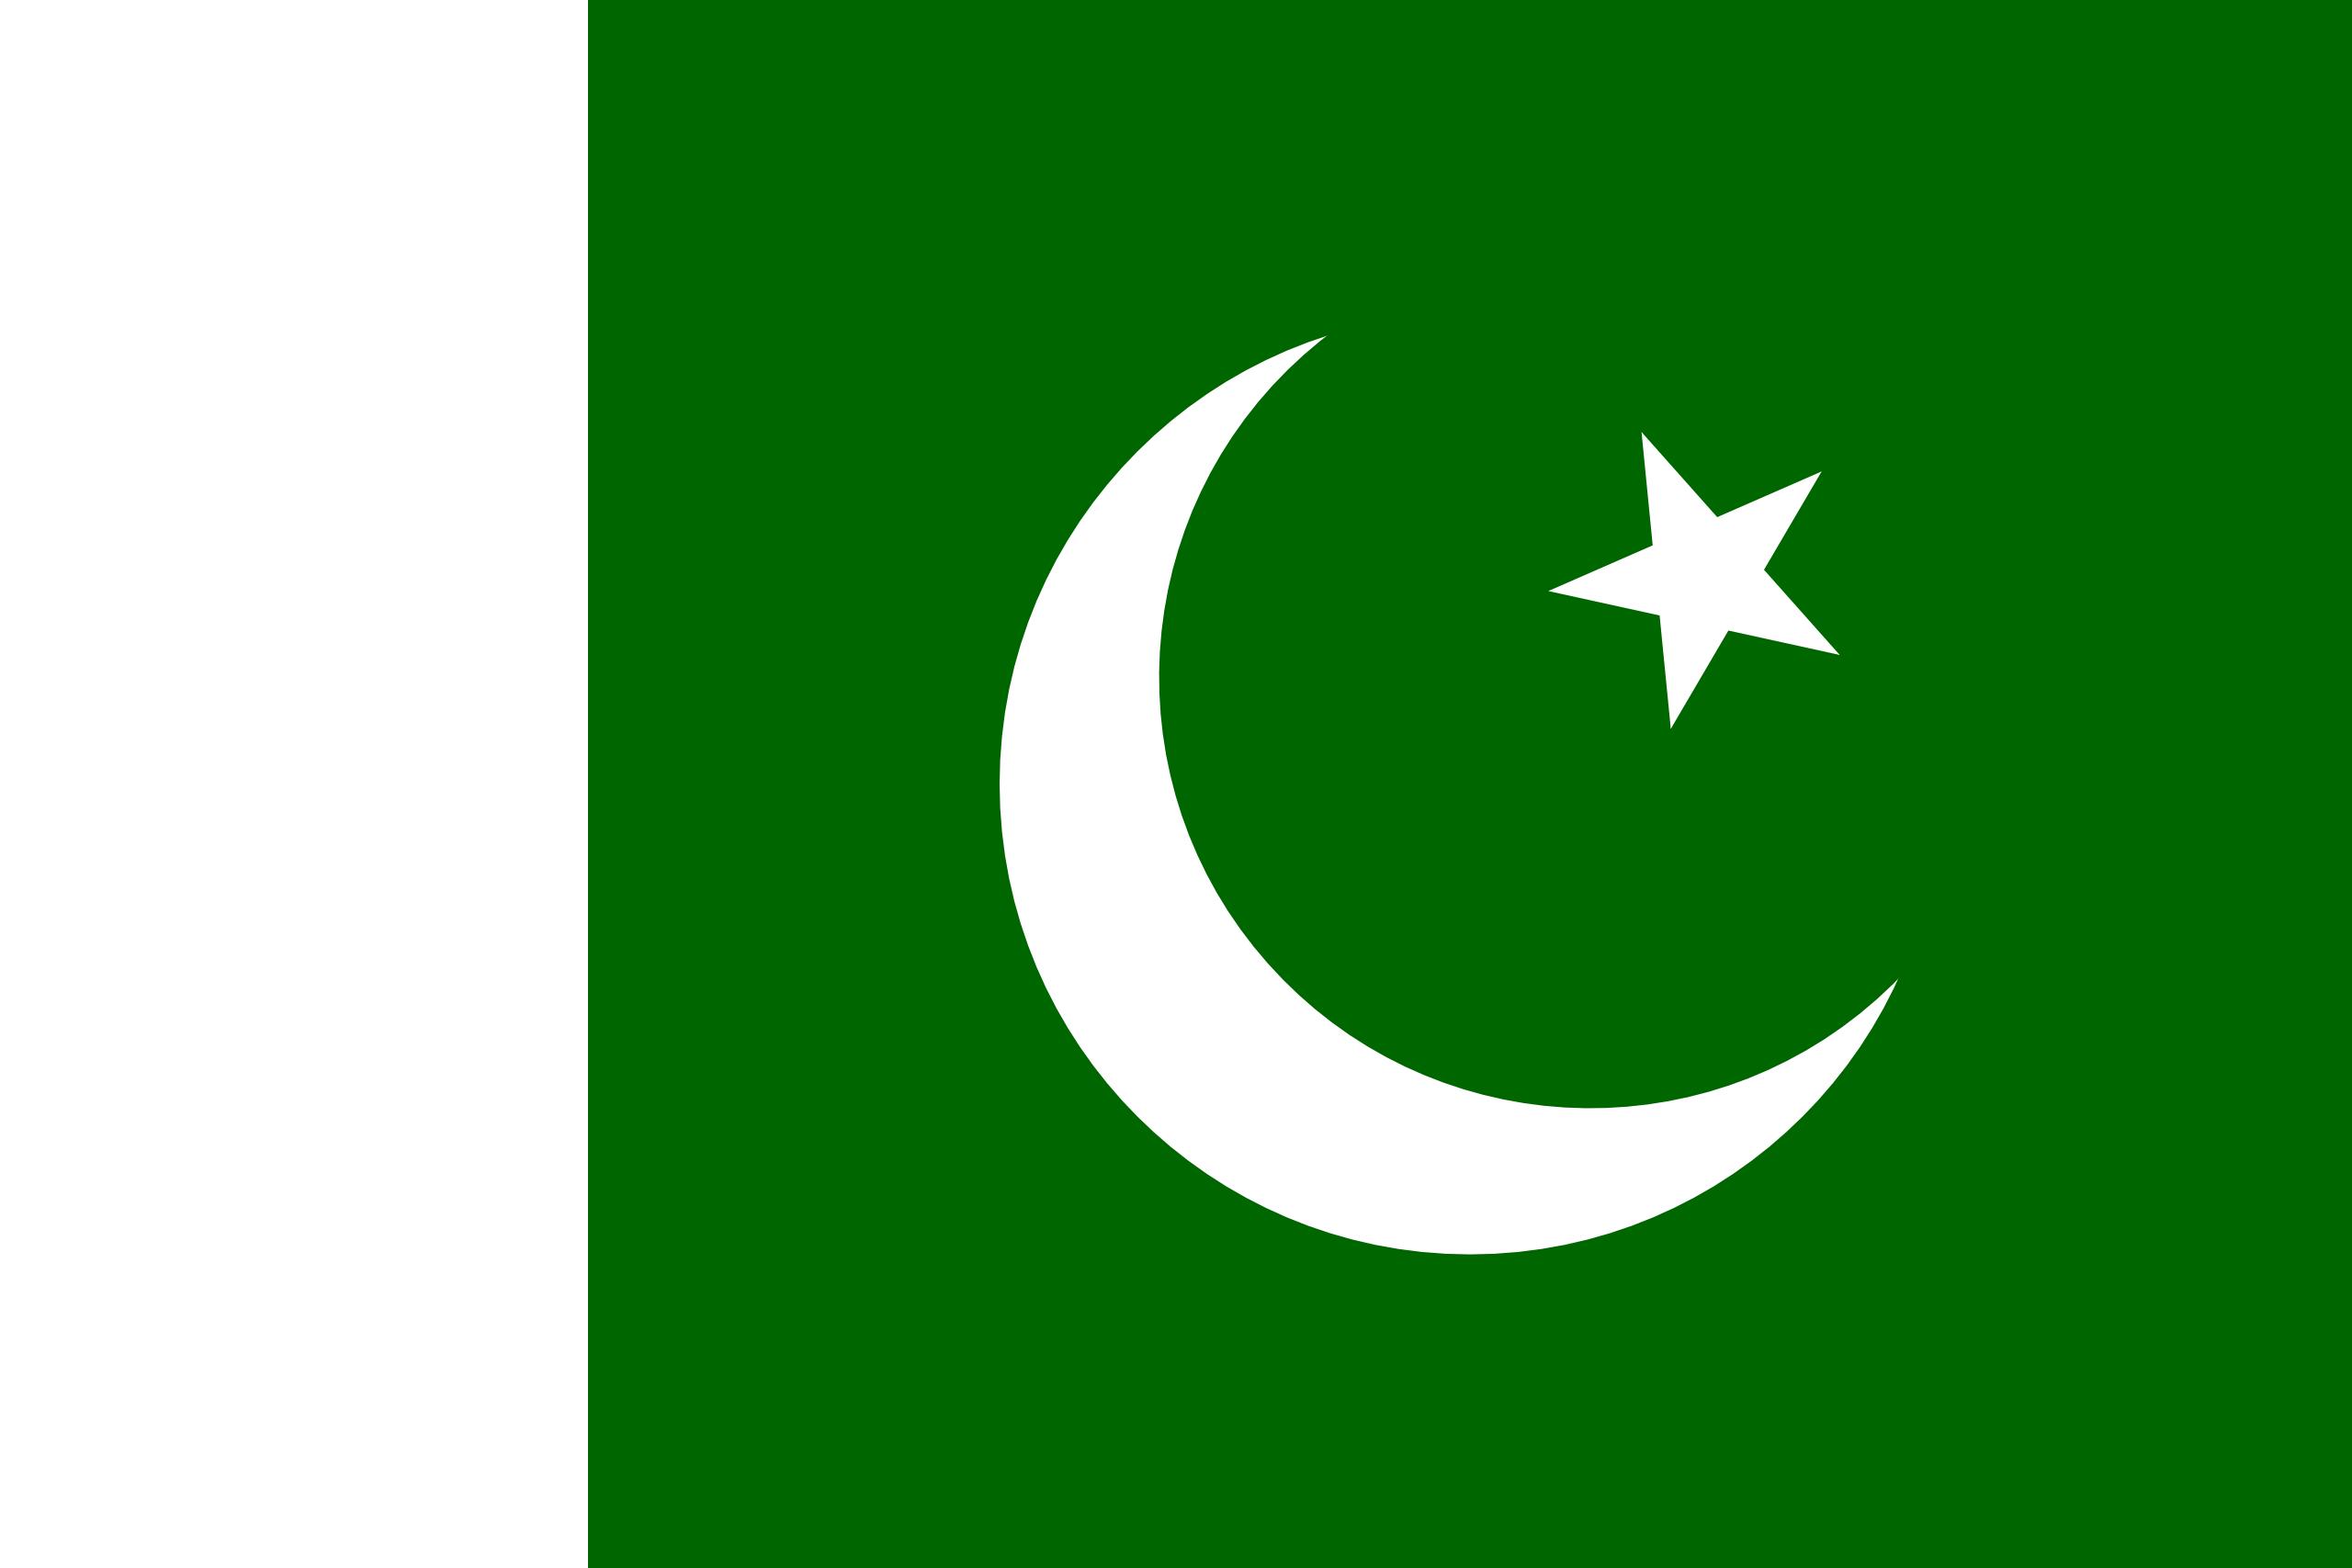 pakistán, país, emblema, insignia, シンボル - HD の壁紙 - 教授-falken.com